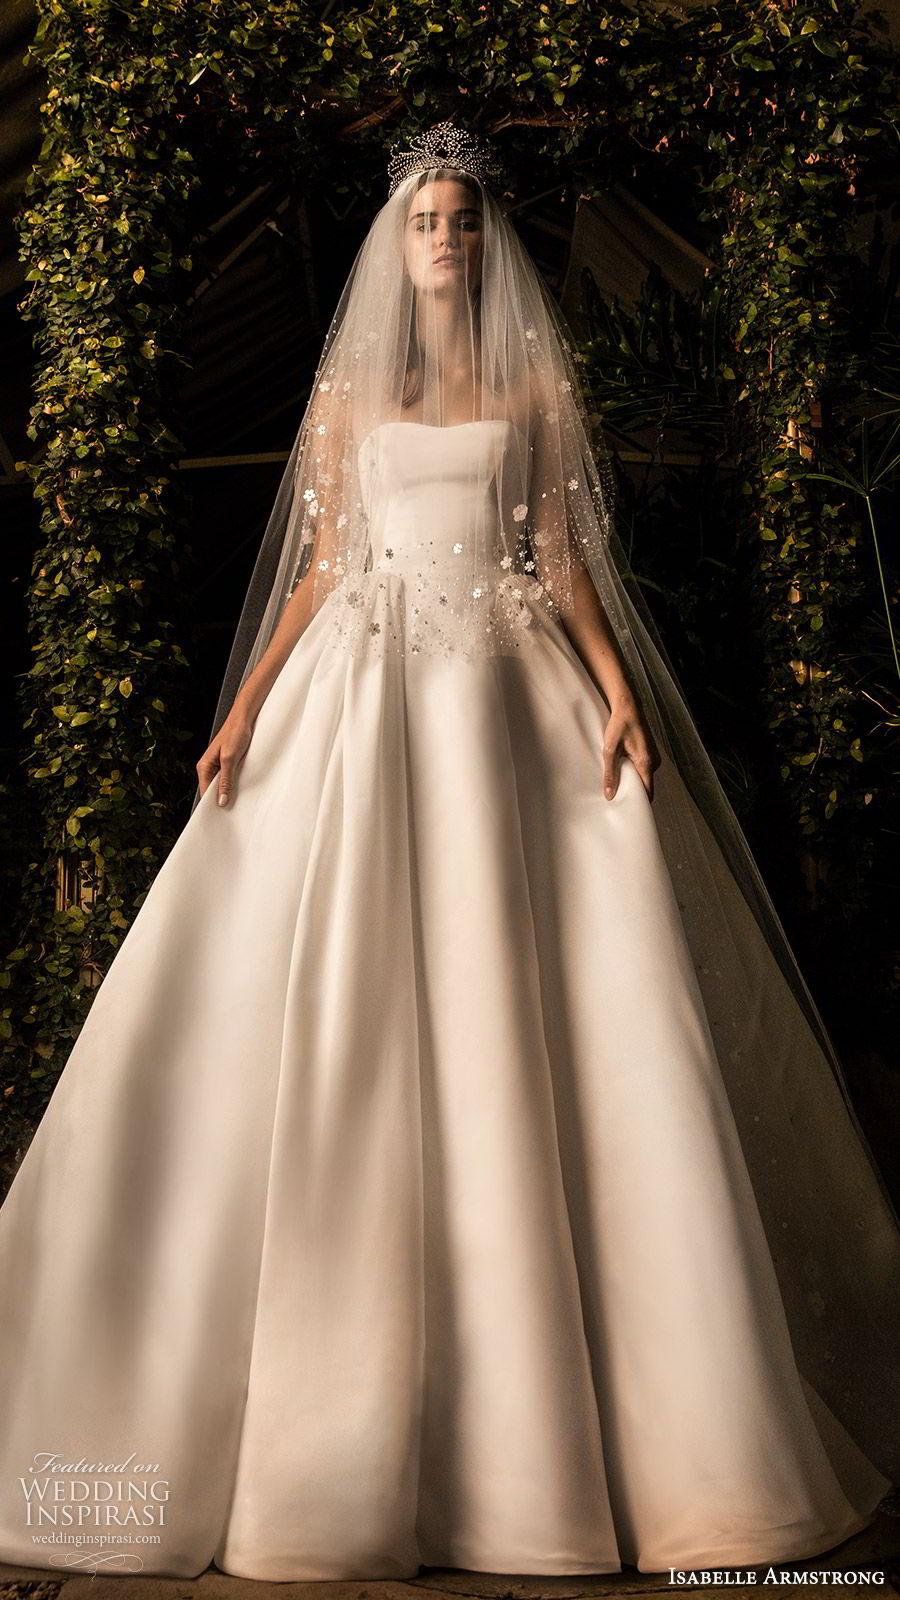 isabelle armstrong fall 2019 bridal strapless semi sweetheart ball gown wedding dress clean minimal (1) romantic timeless veil tiara mv